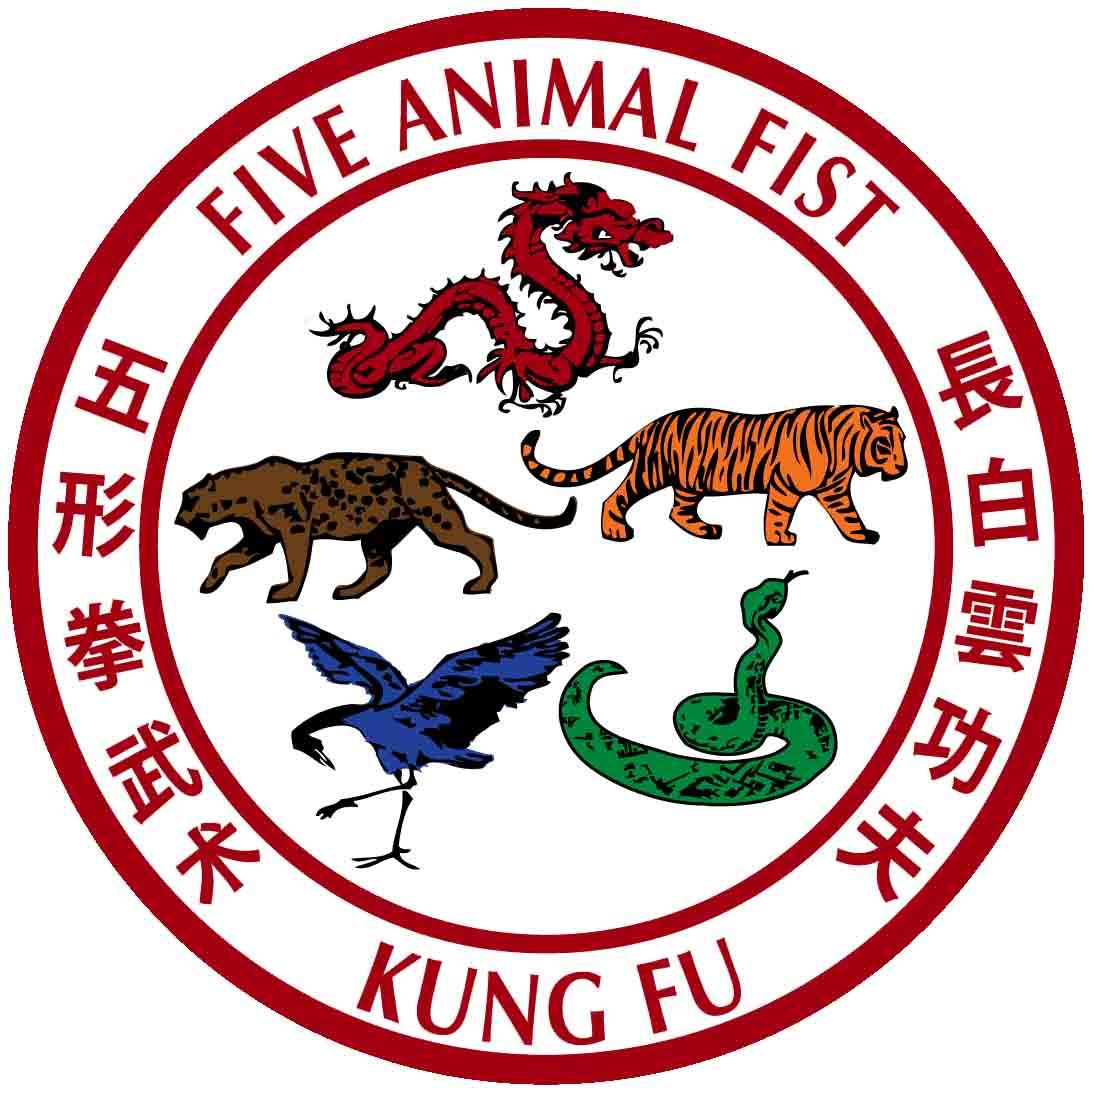 Fist of kung fu